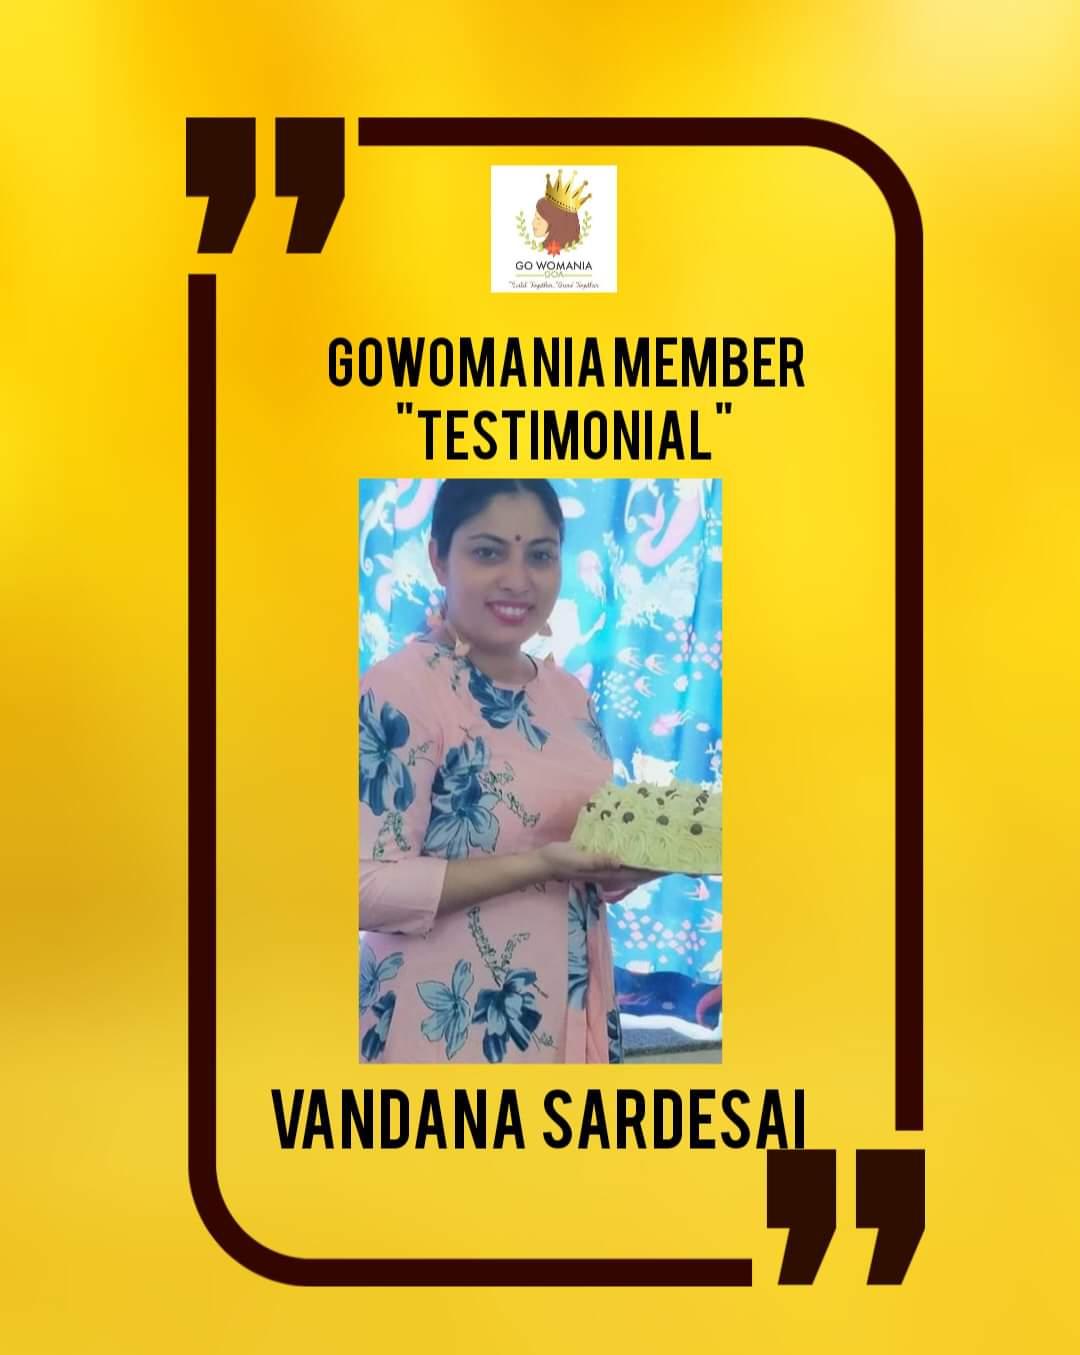 Vandana Saradesai